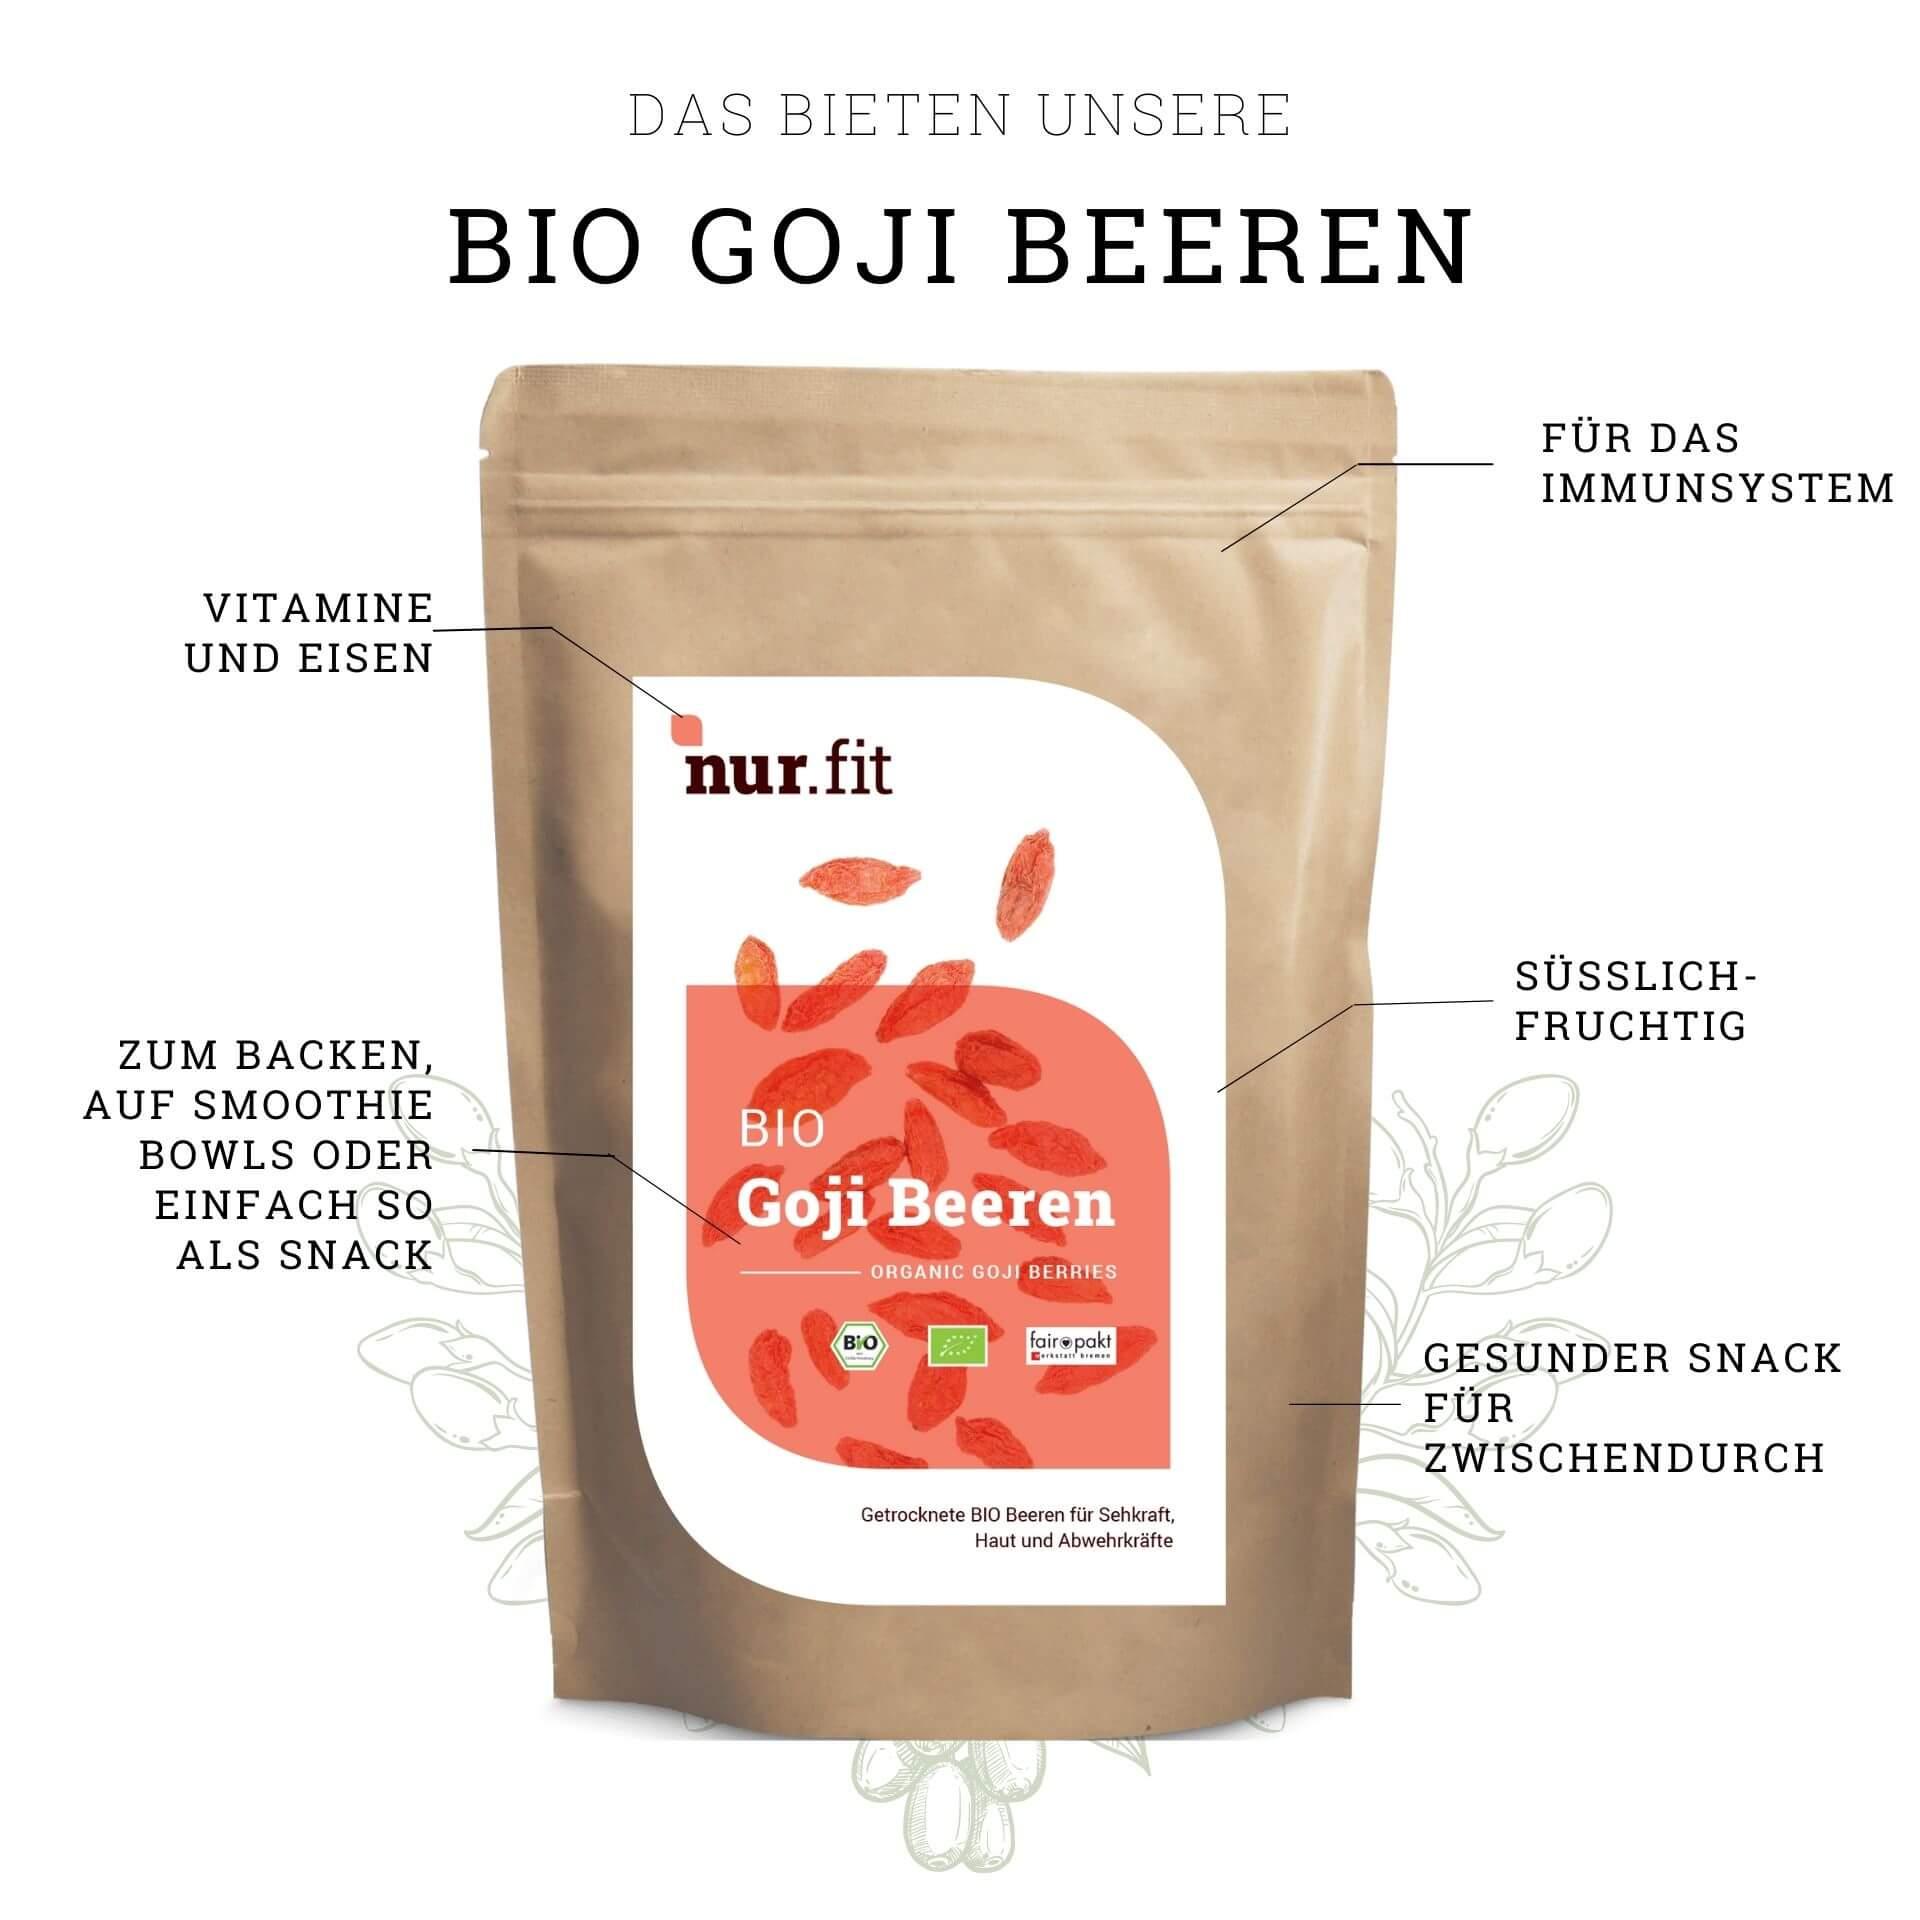 Organic Sirt-Food Set